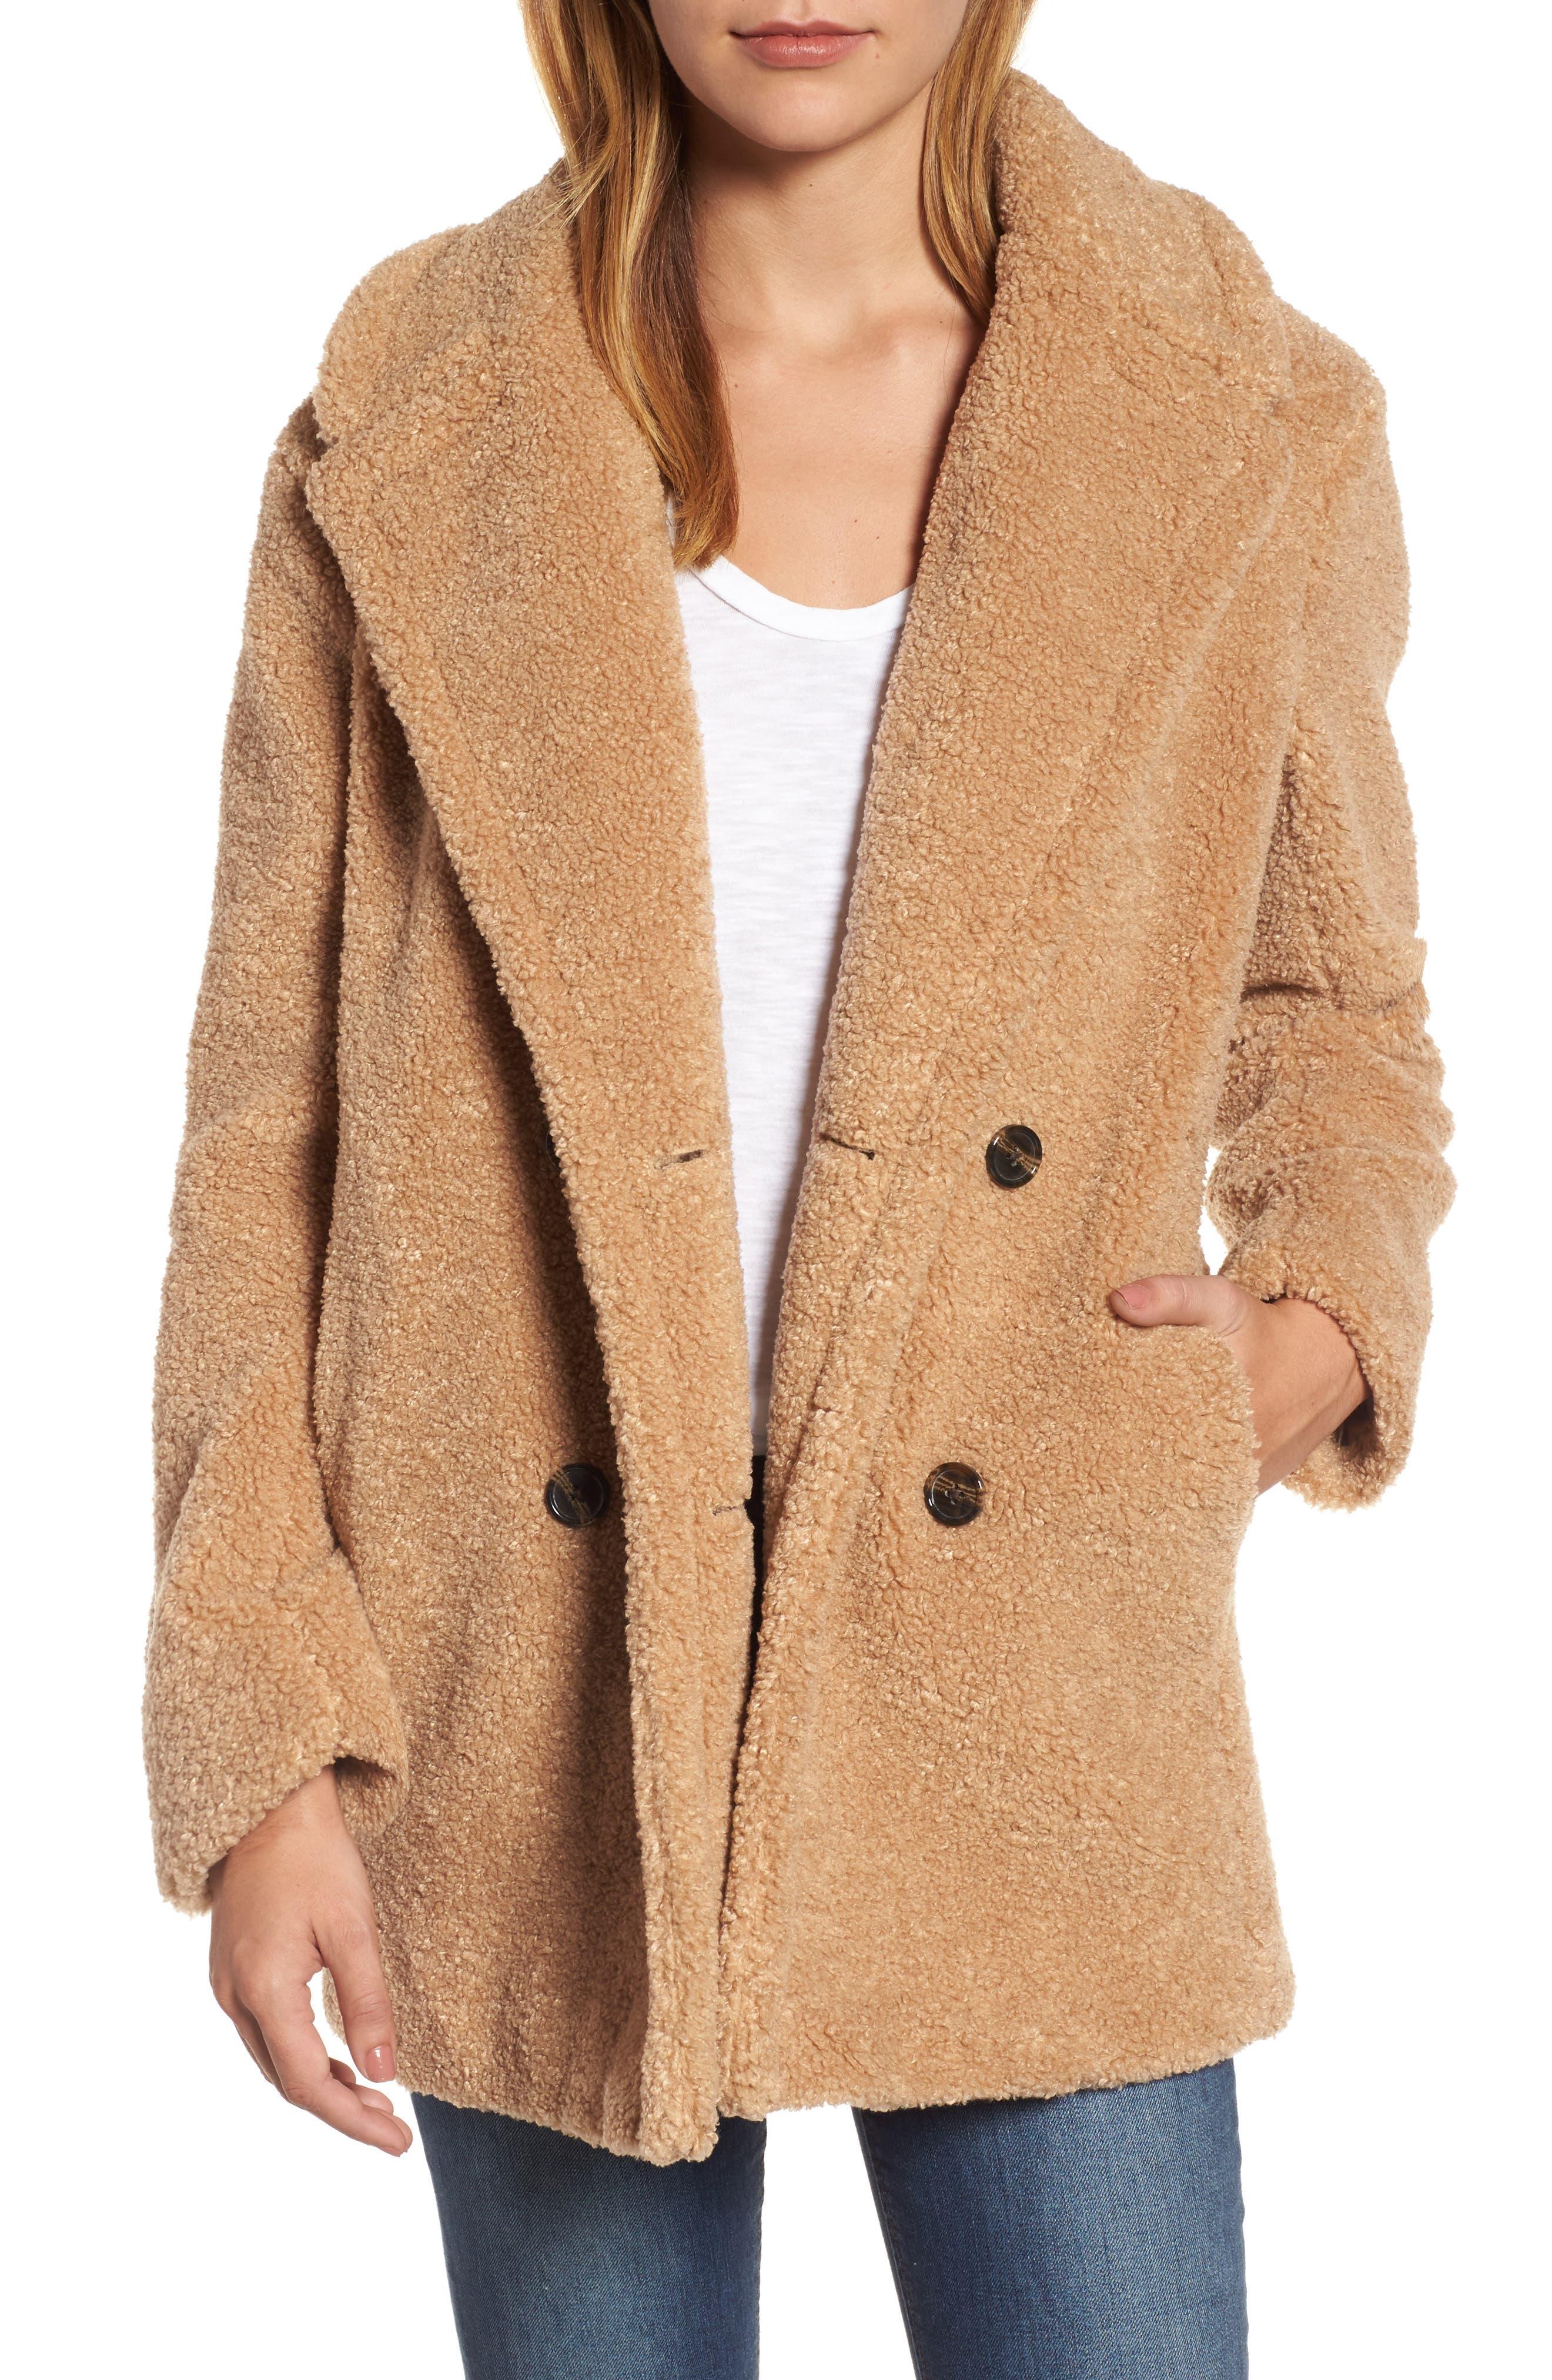 Alternate Image 1 Selected - kensie Teddy Bear Notch Collar Faux Fur Coat